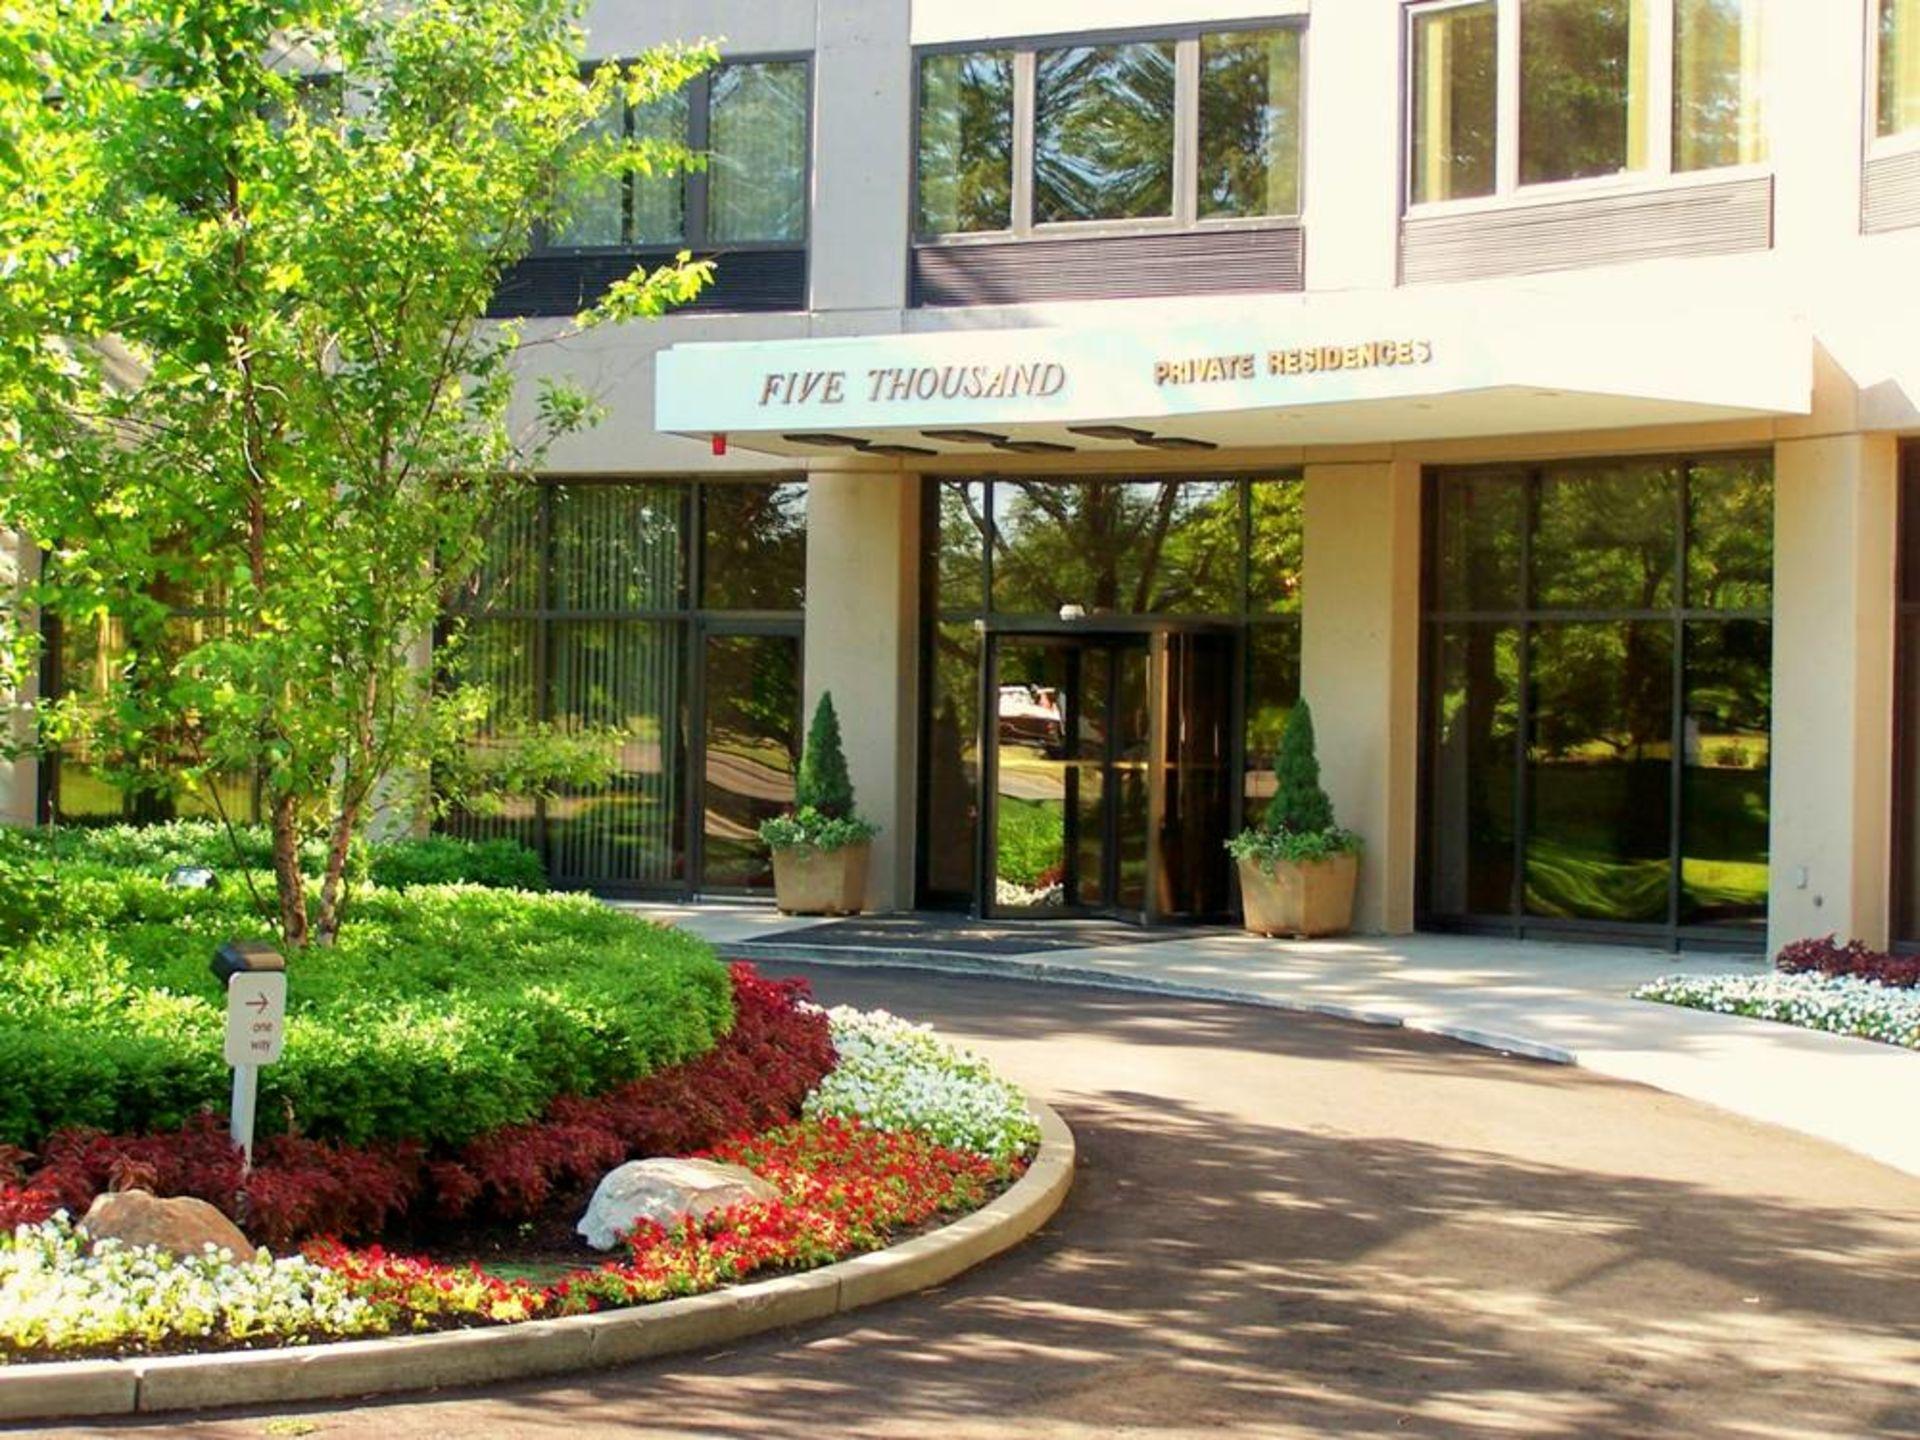 Luxury Penthouse For Sale | Greater Metro-Detroit Skyline | Keller Williams International Realty